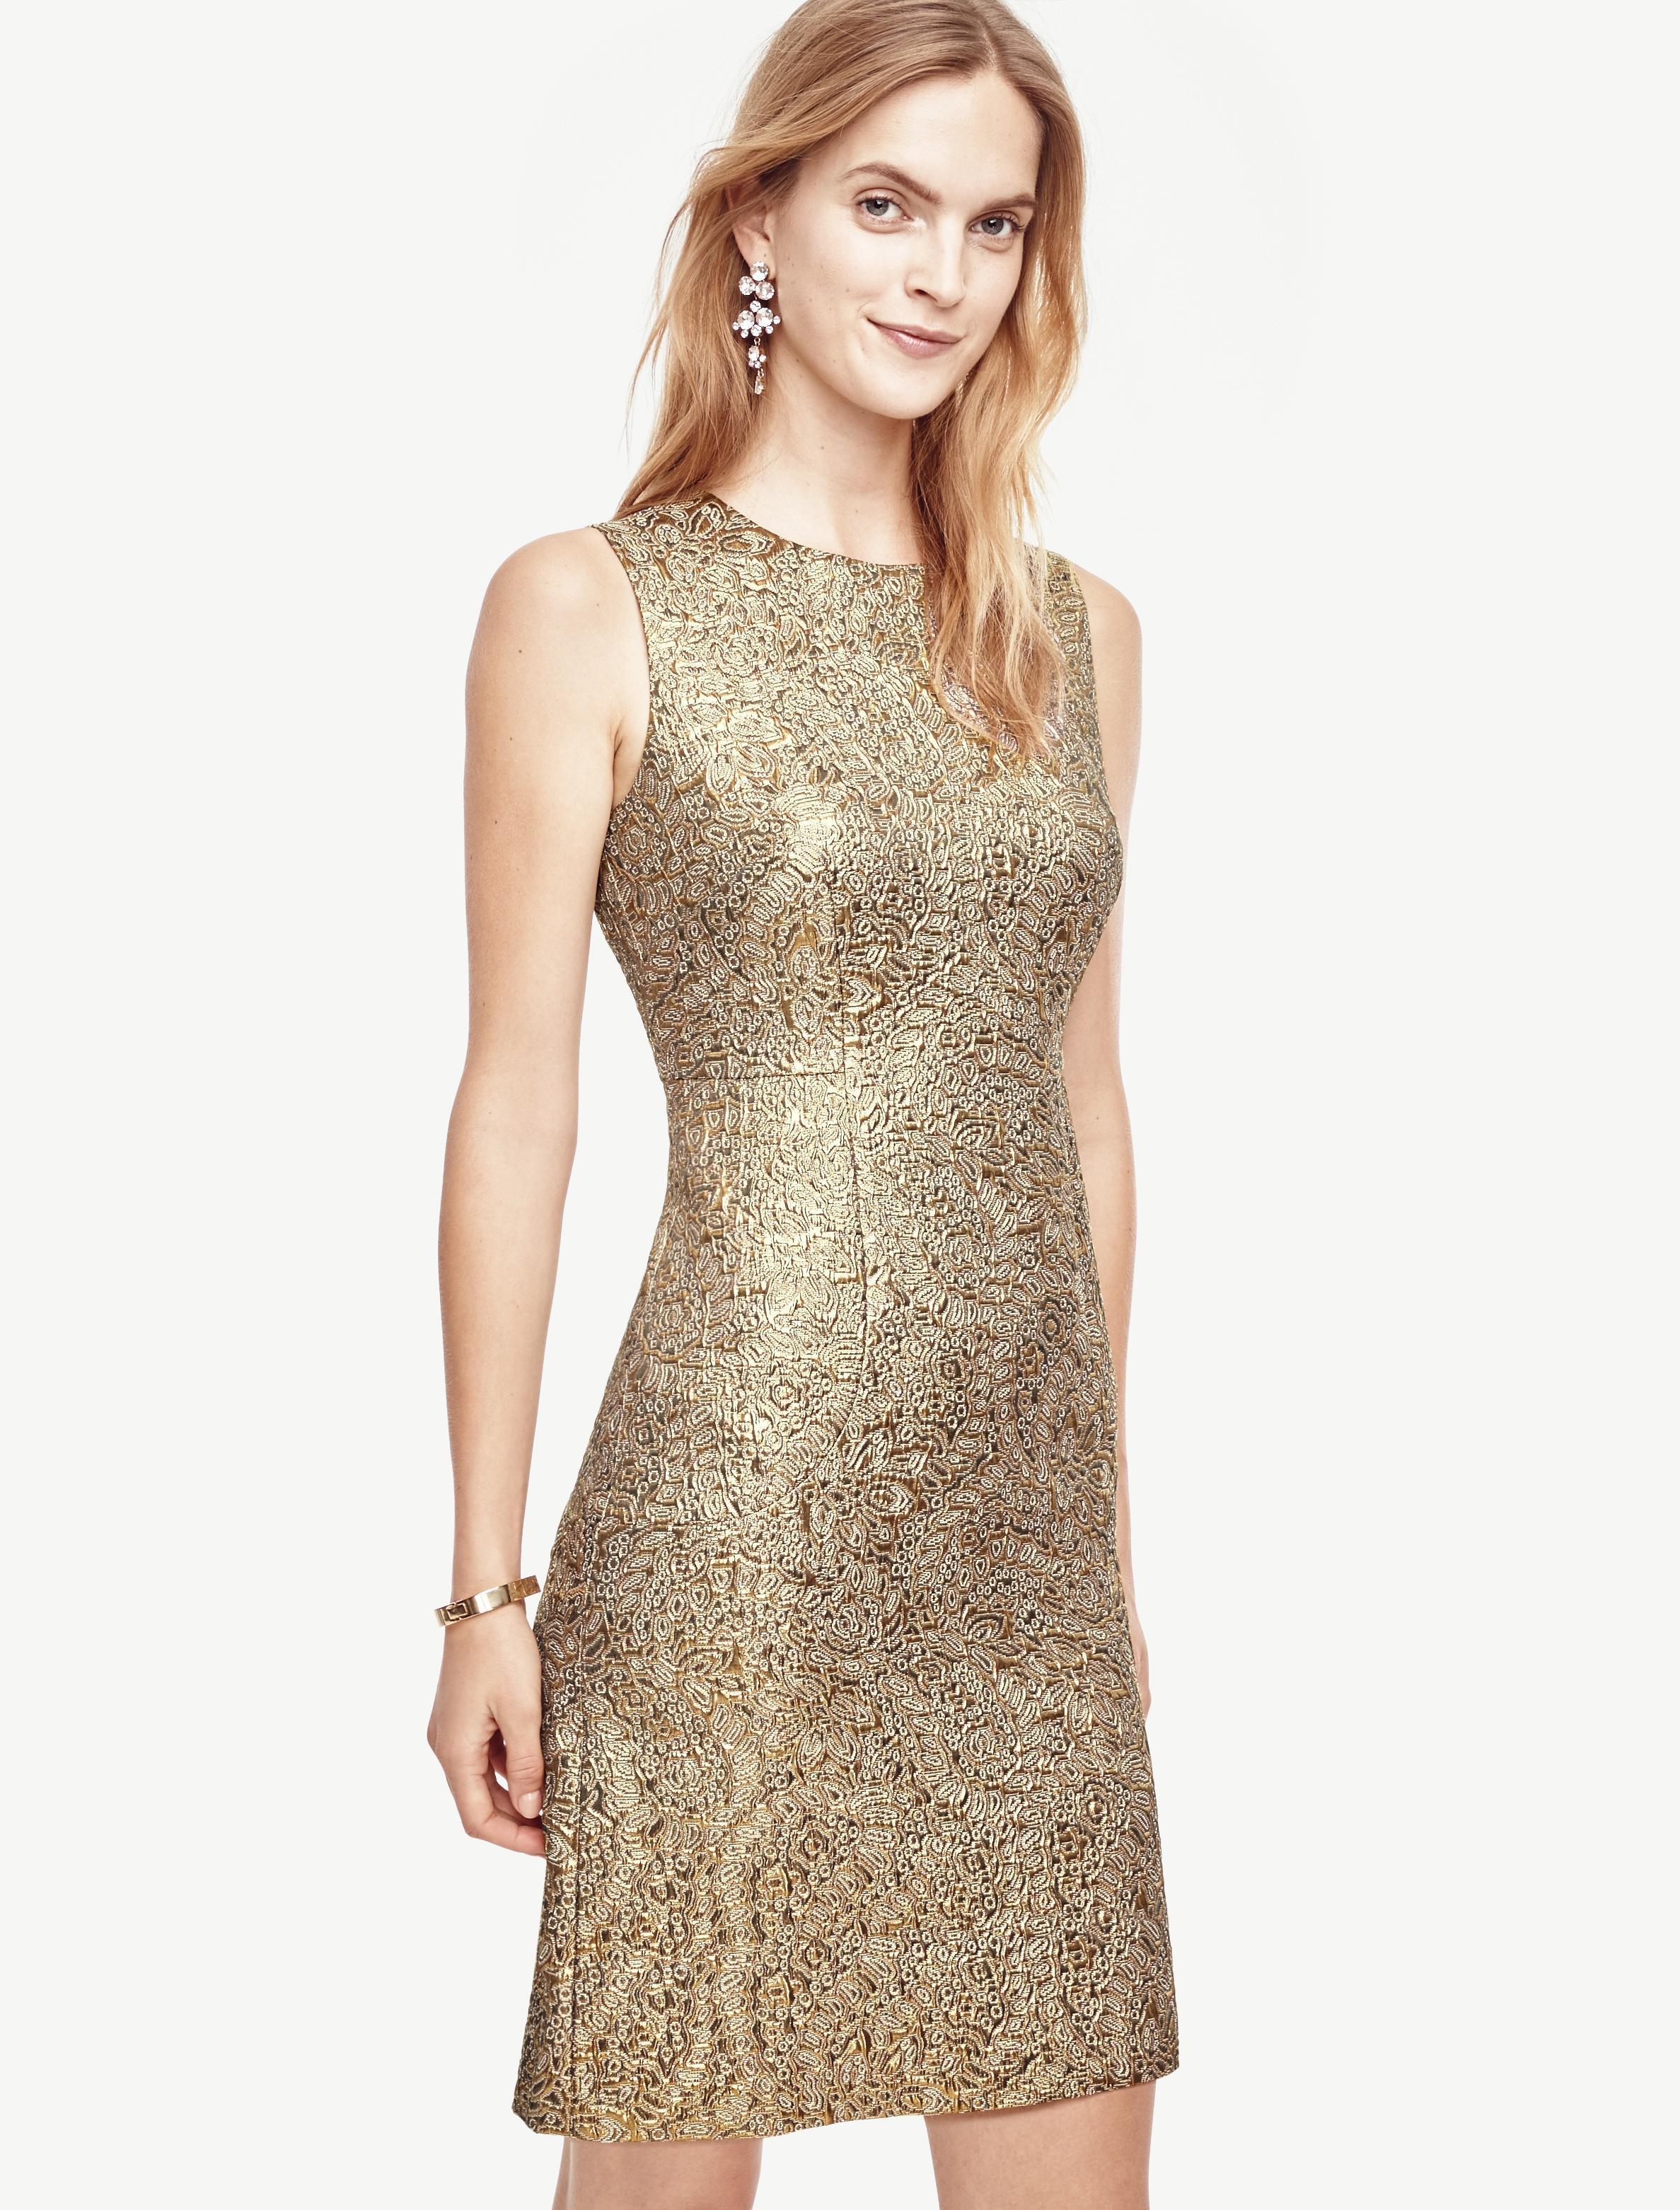 Lyst - Ann Taylor Shimmer Jacquard Flare Dress in Metallic